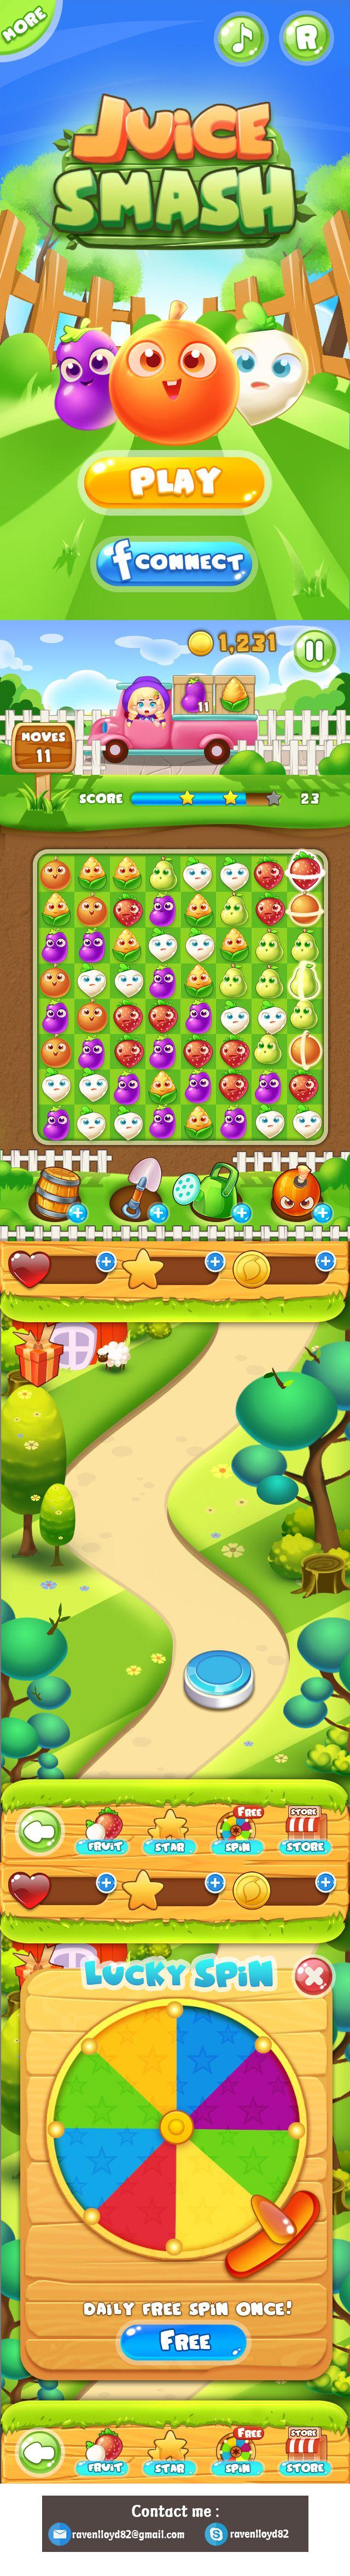 Mobile game -Juice Smash on Behance